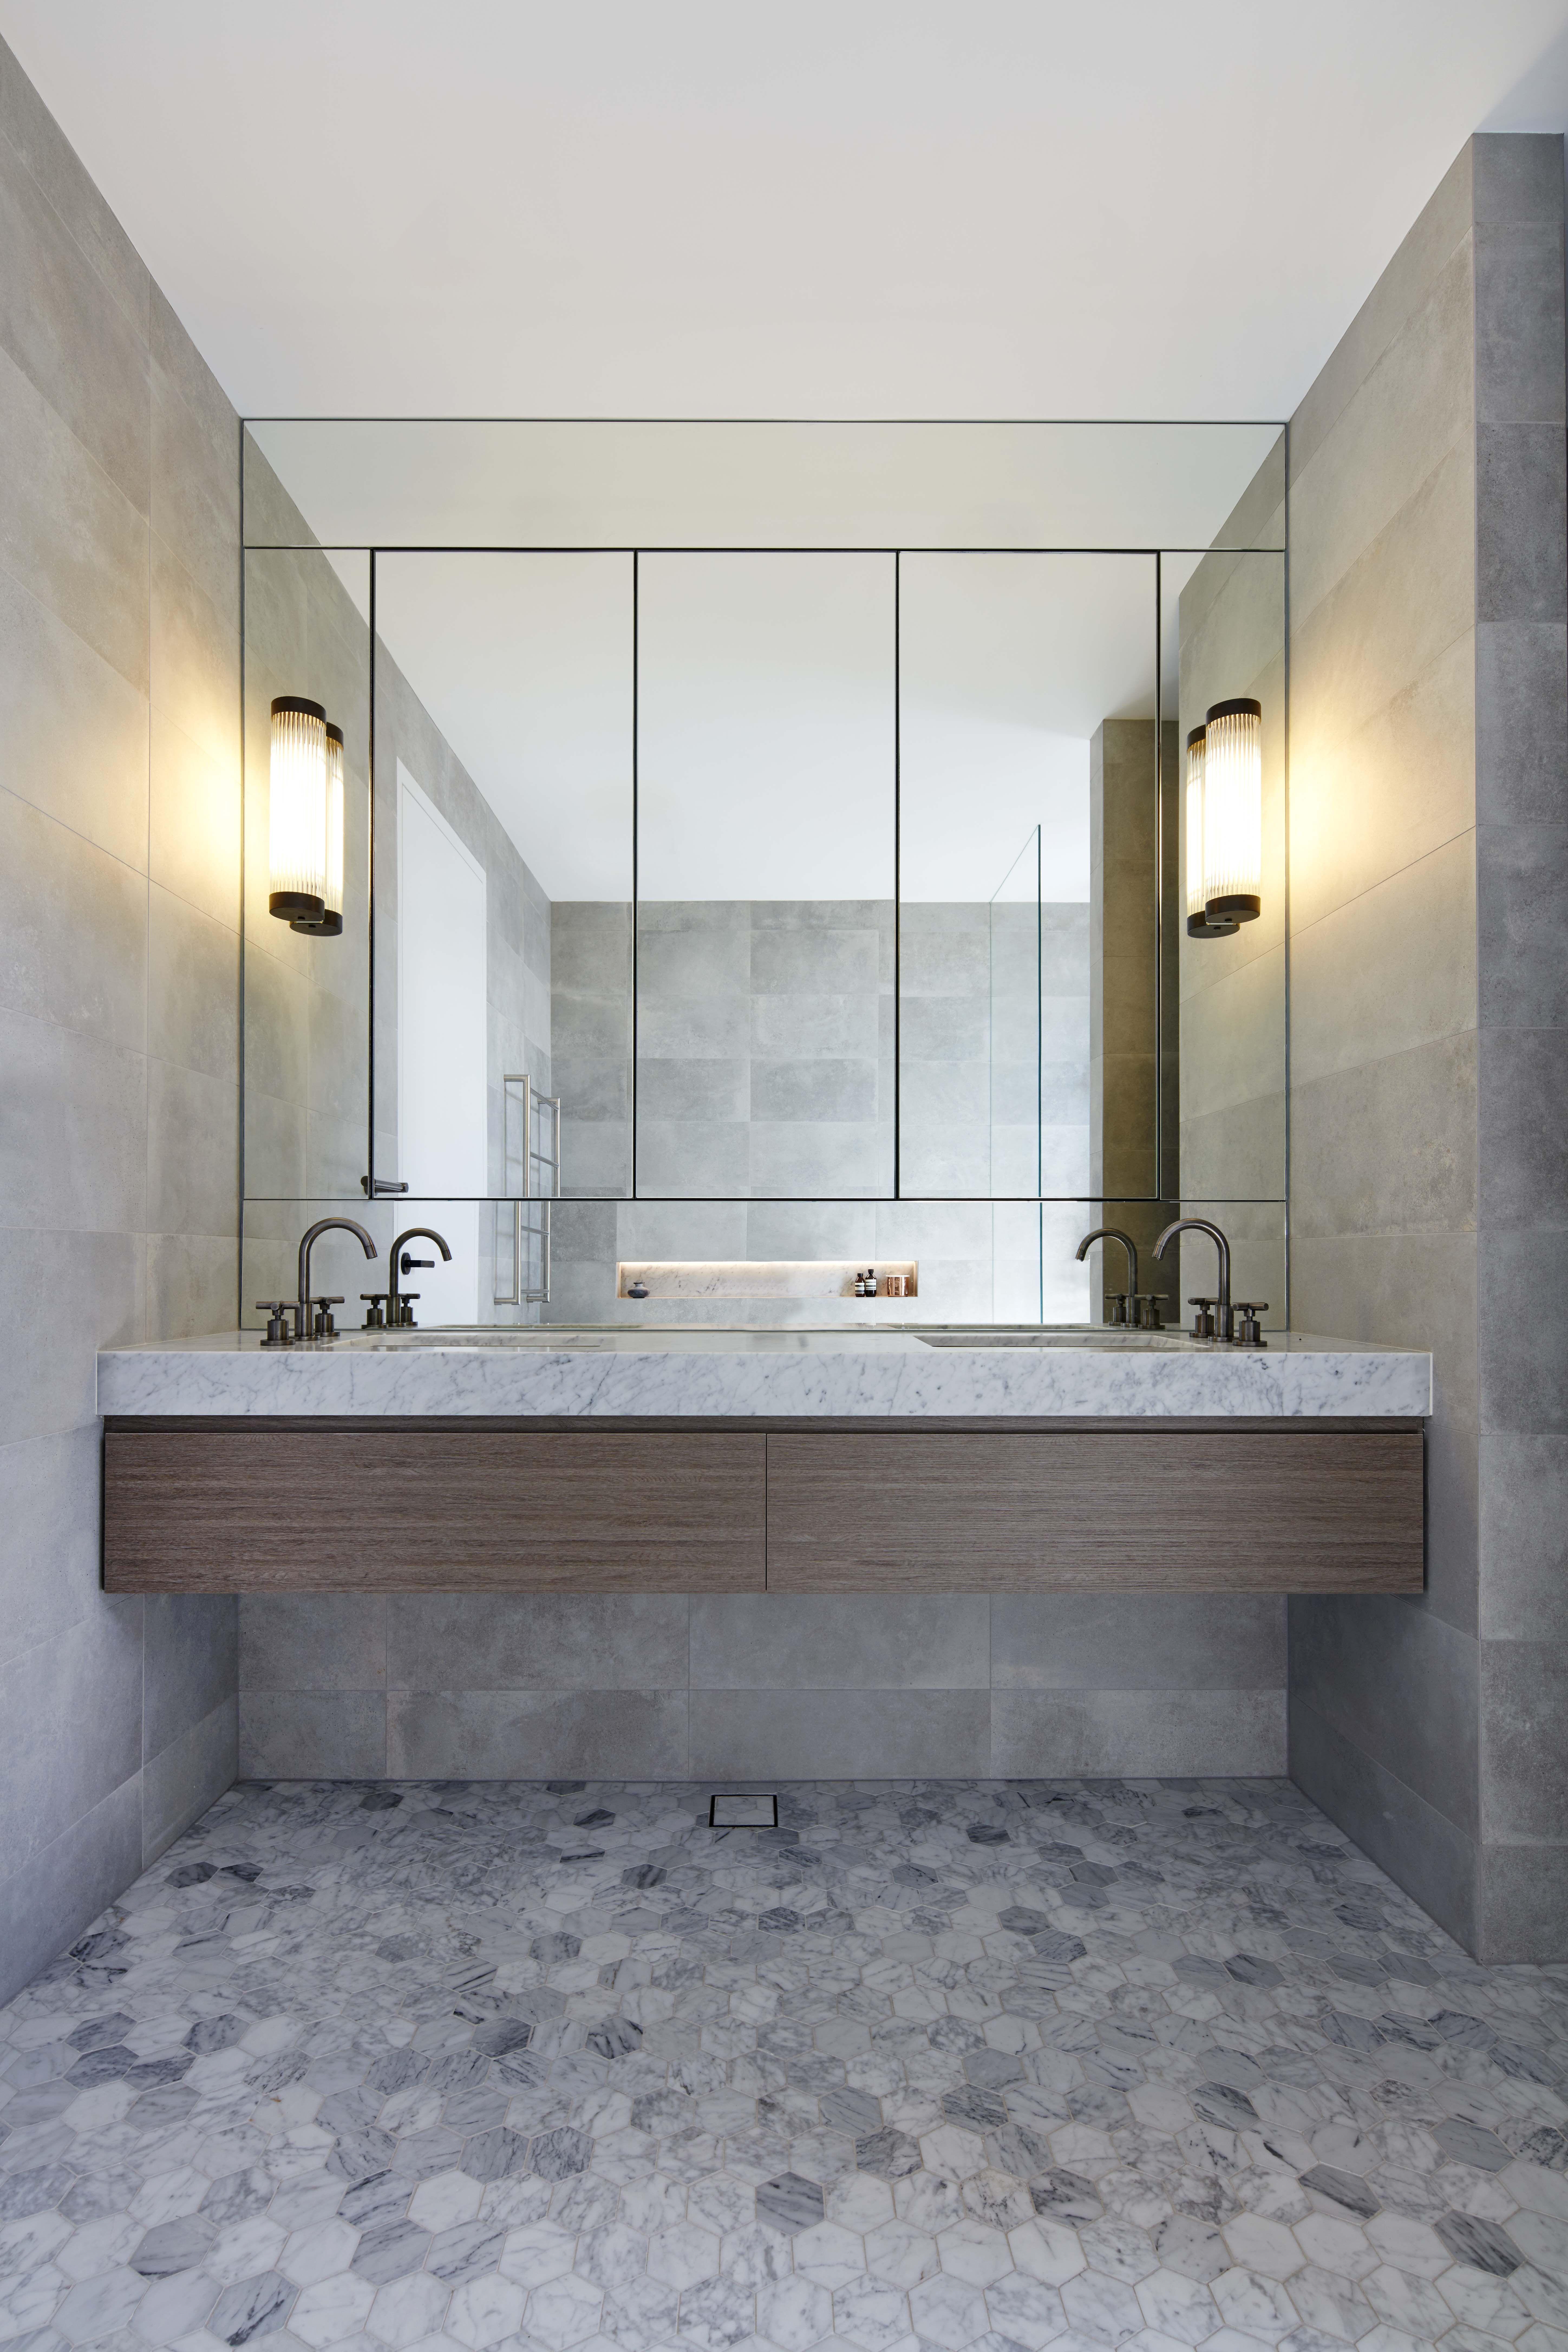 45 Best Bathroom Storage Cabinets For Wall And Floor That Will Help You Bathroom Mirror Cabinet Bathroom Design Bathroom Vanity